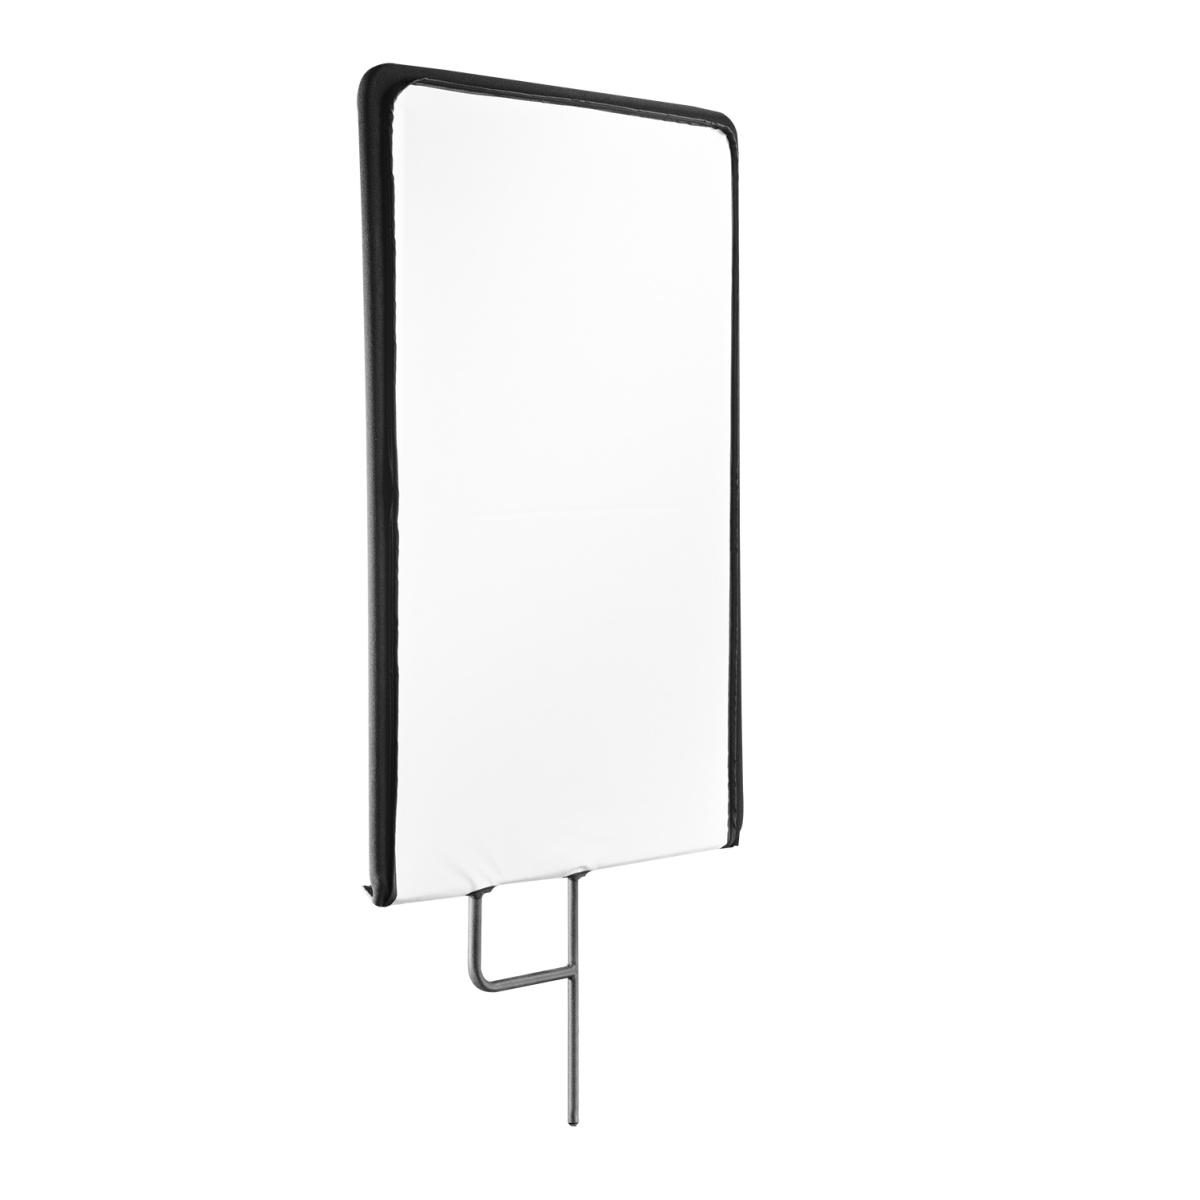 Walimex pro 4in1 Reflector Panel, 45x60cm